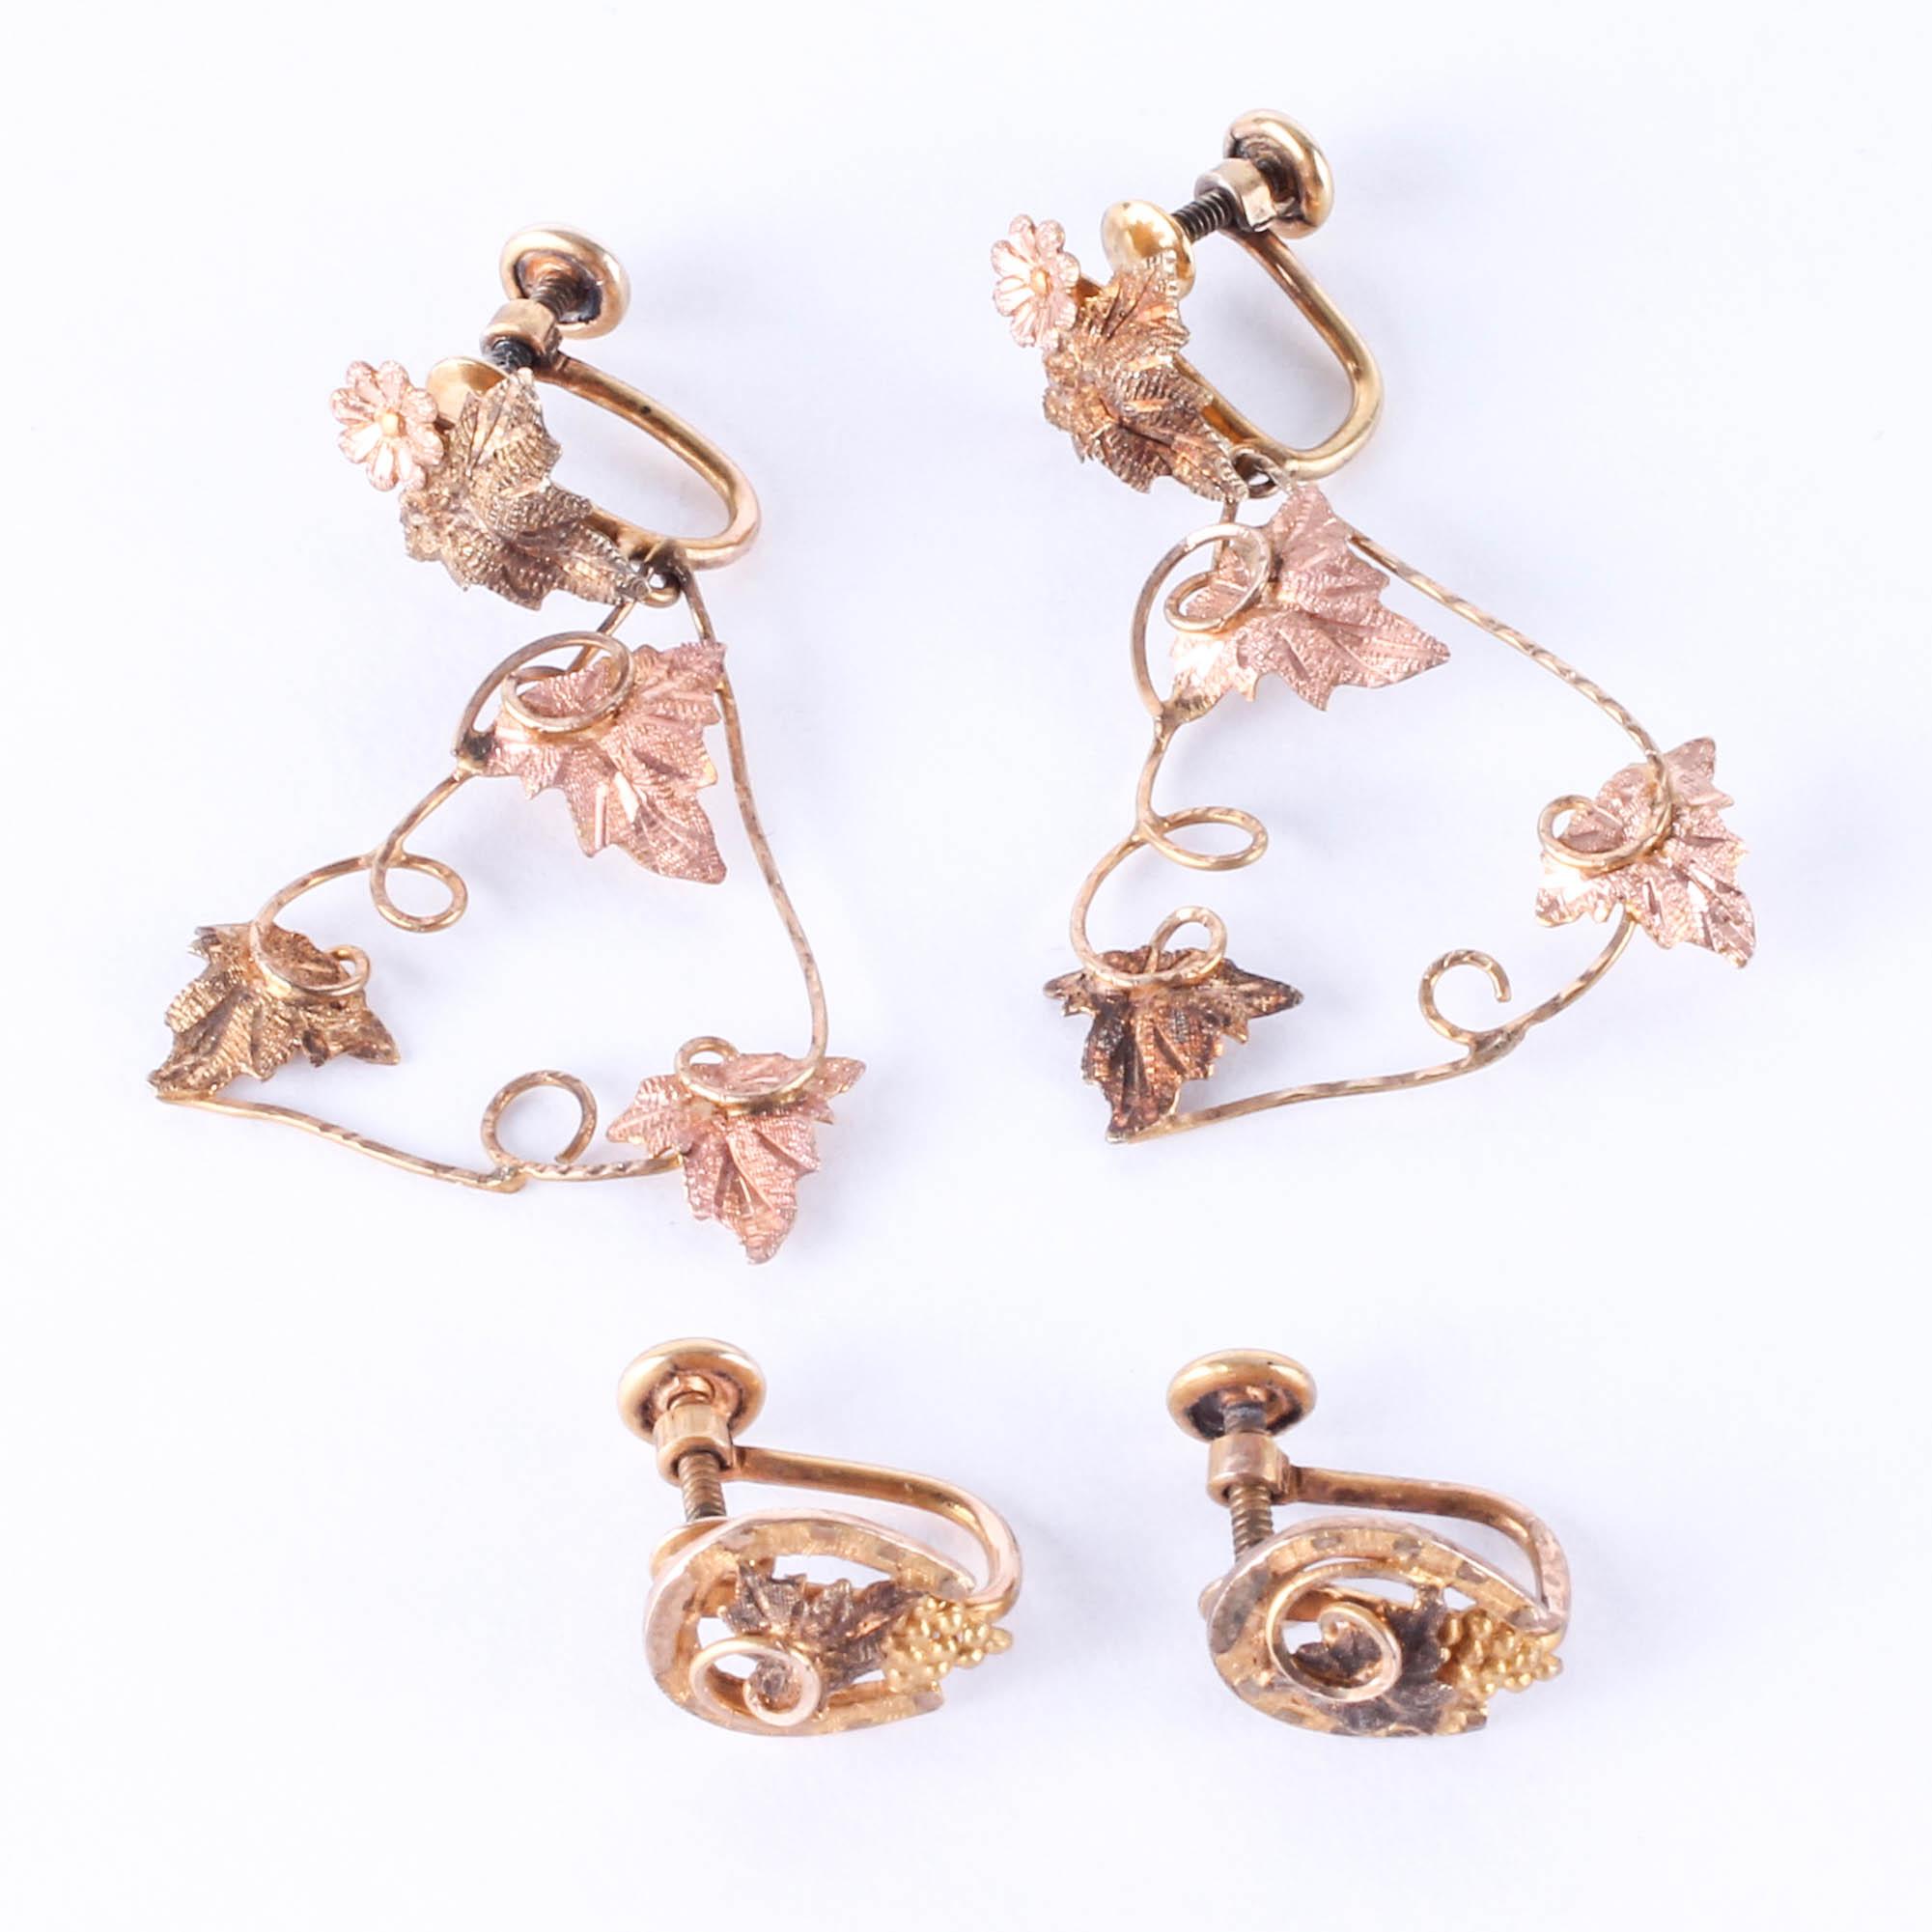 Cripple Creek Gold Jewelry The Best Jewelry 2018